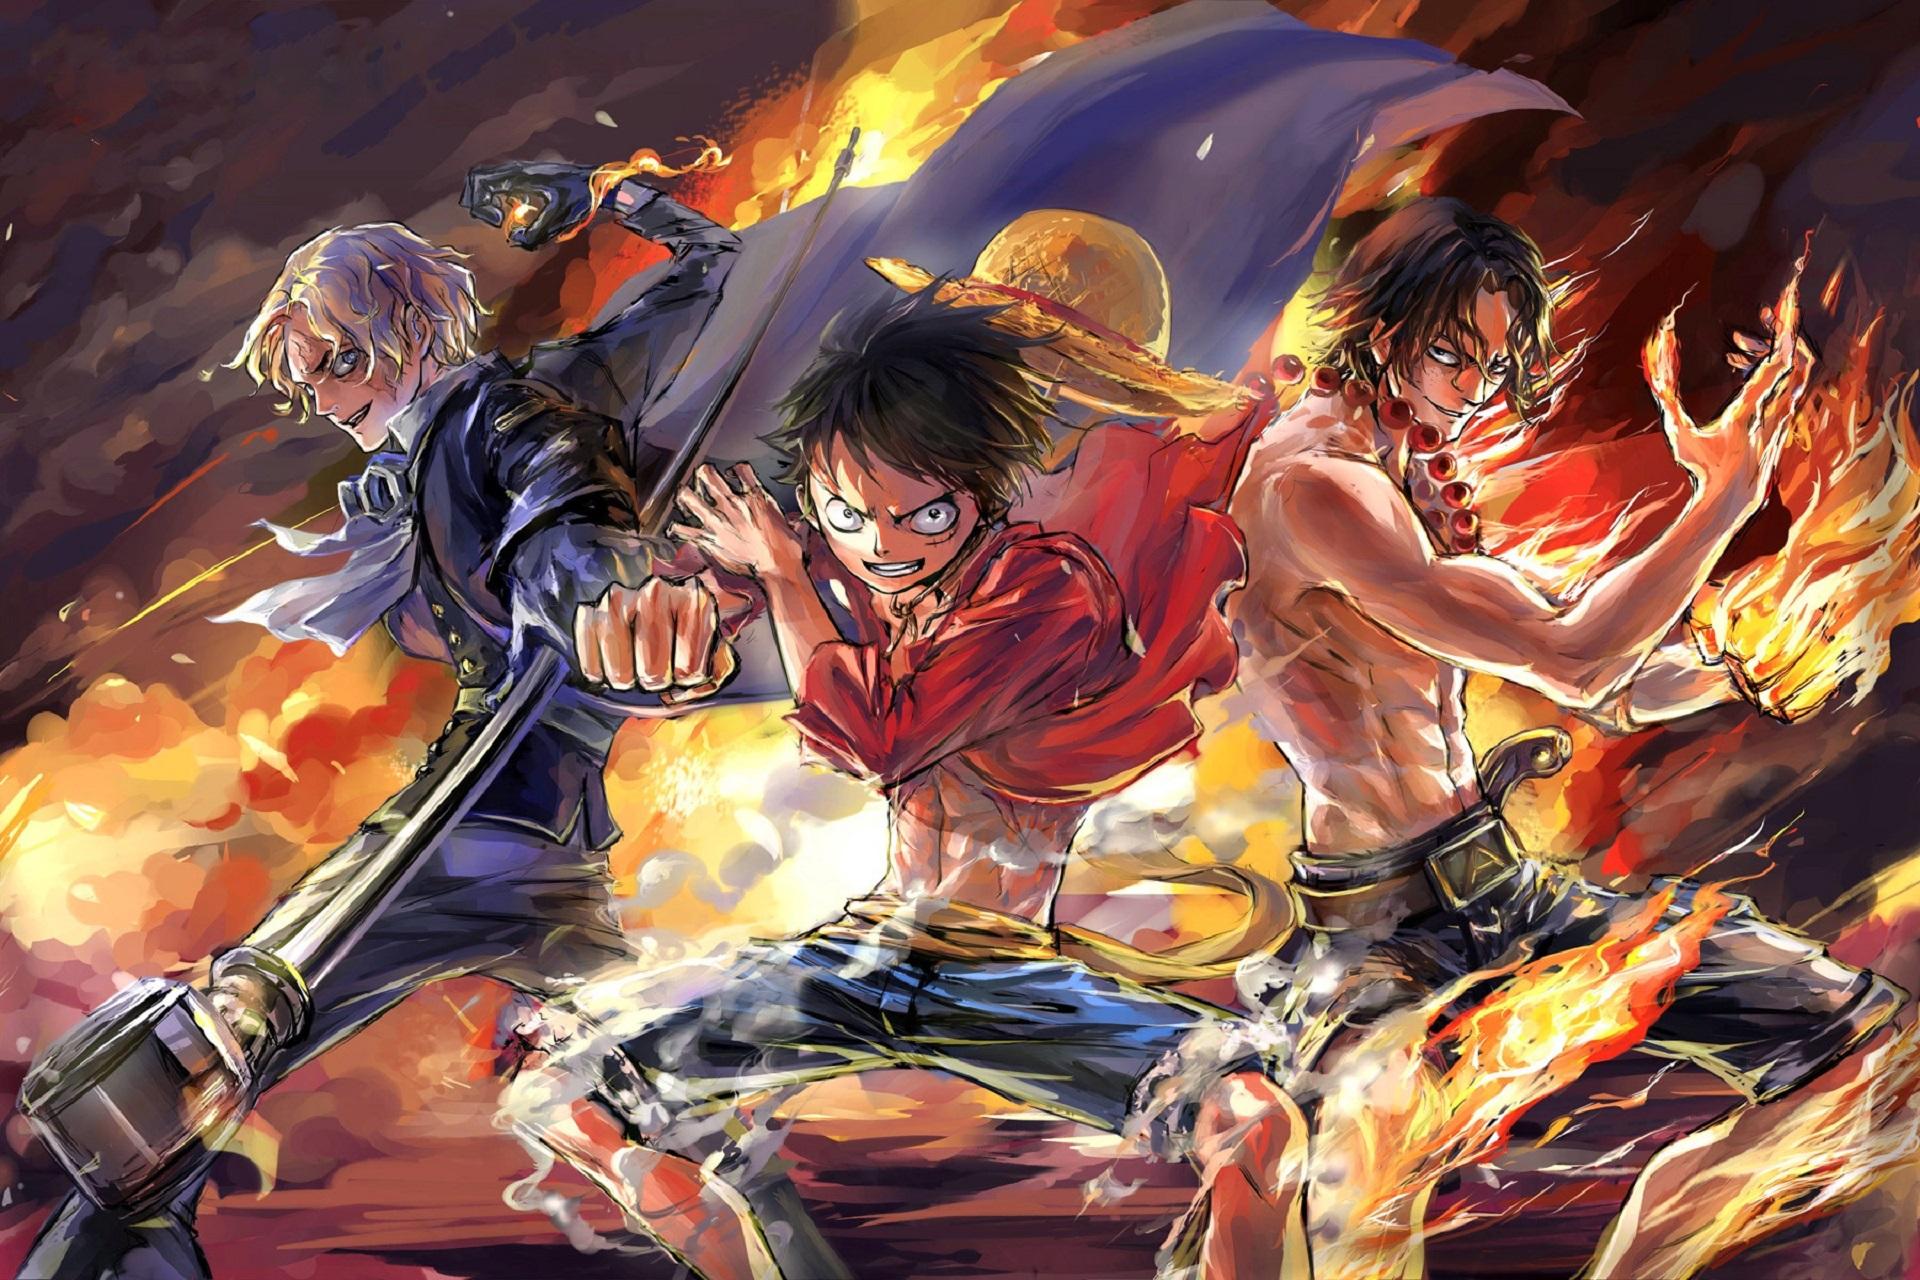 Wallpaper : anime, One Piece 1920x1280